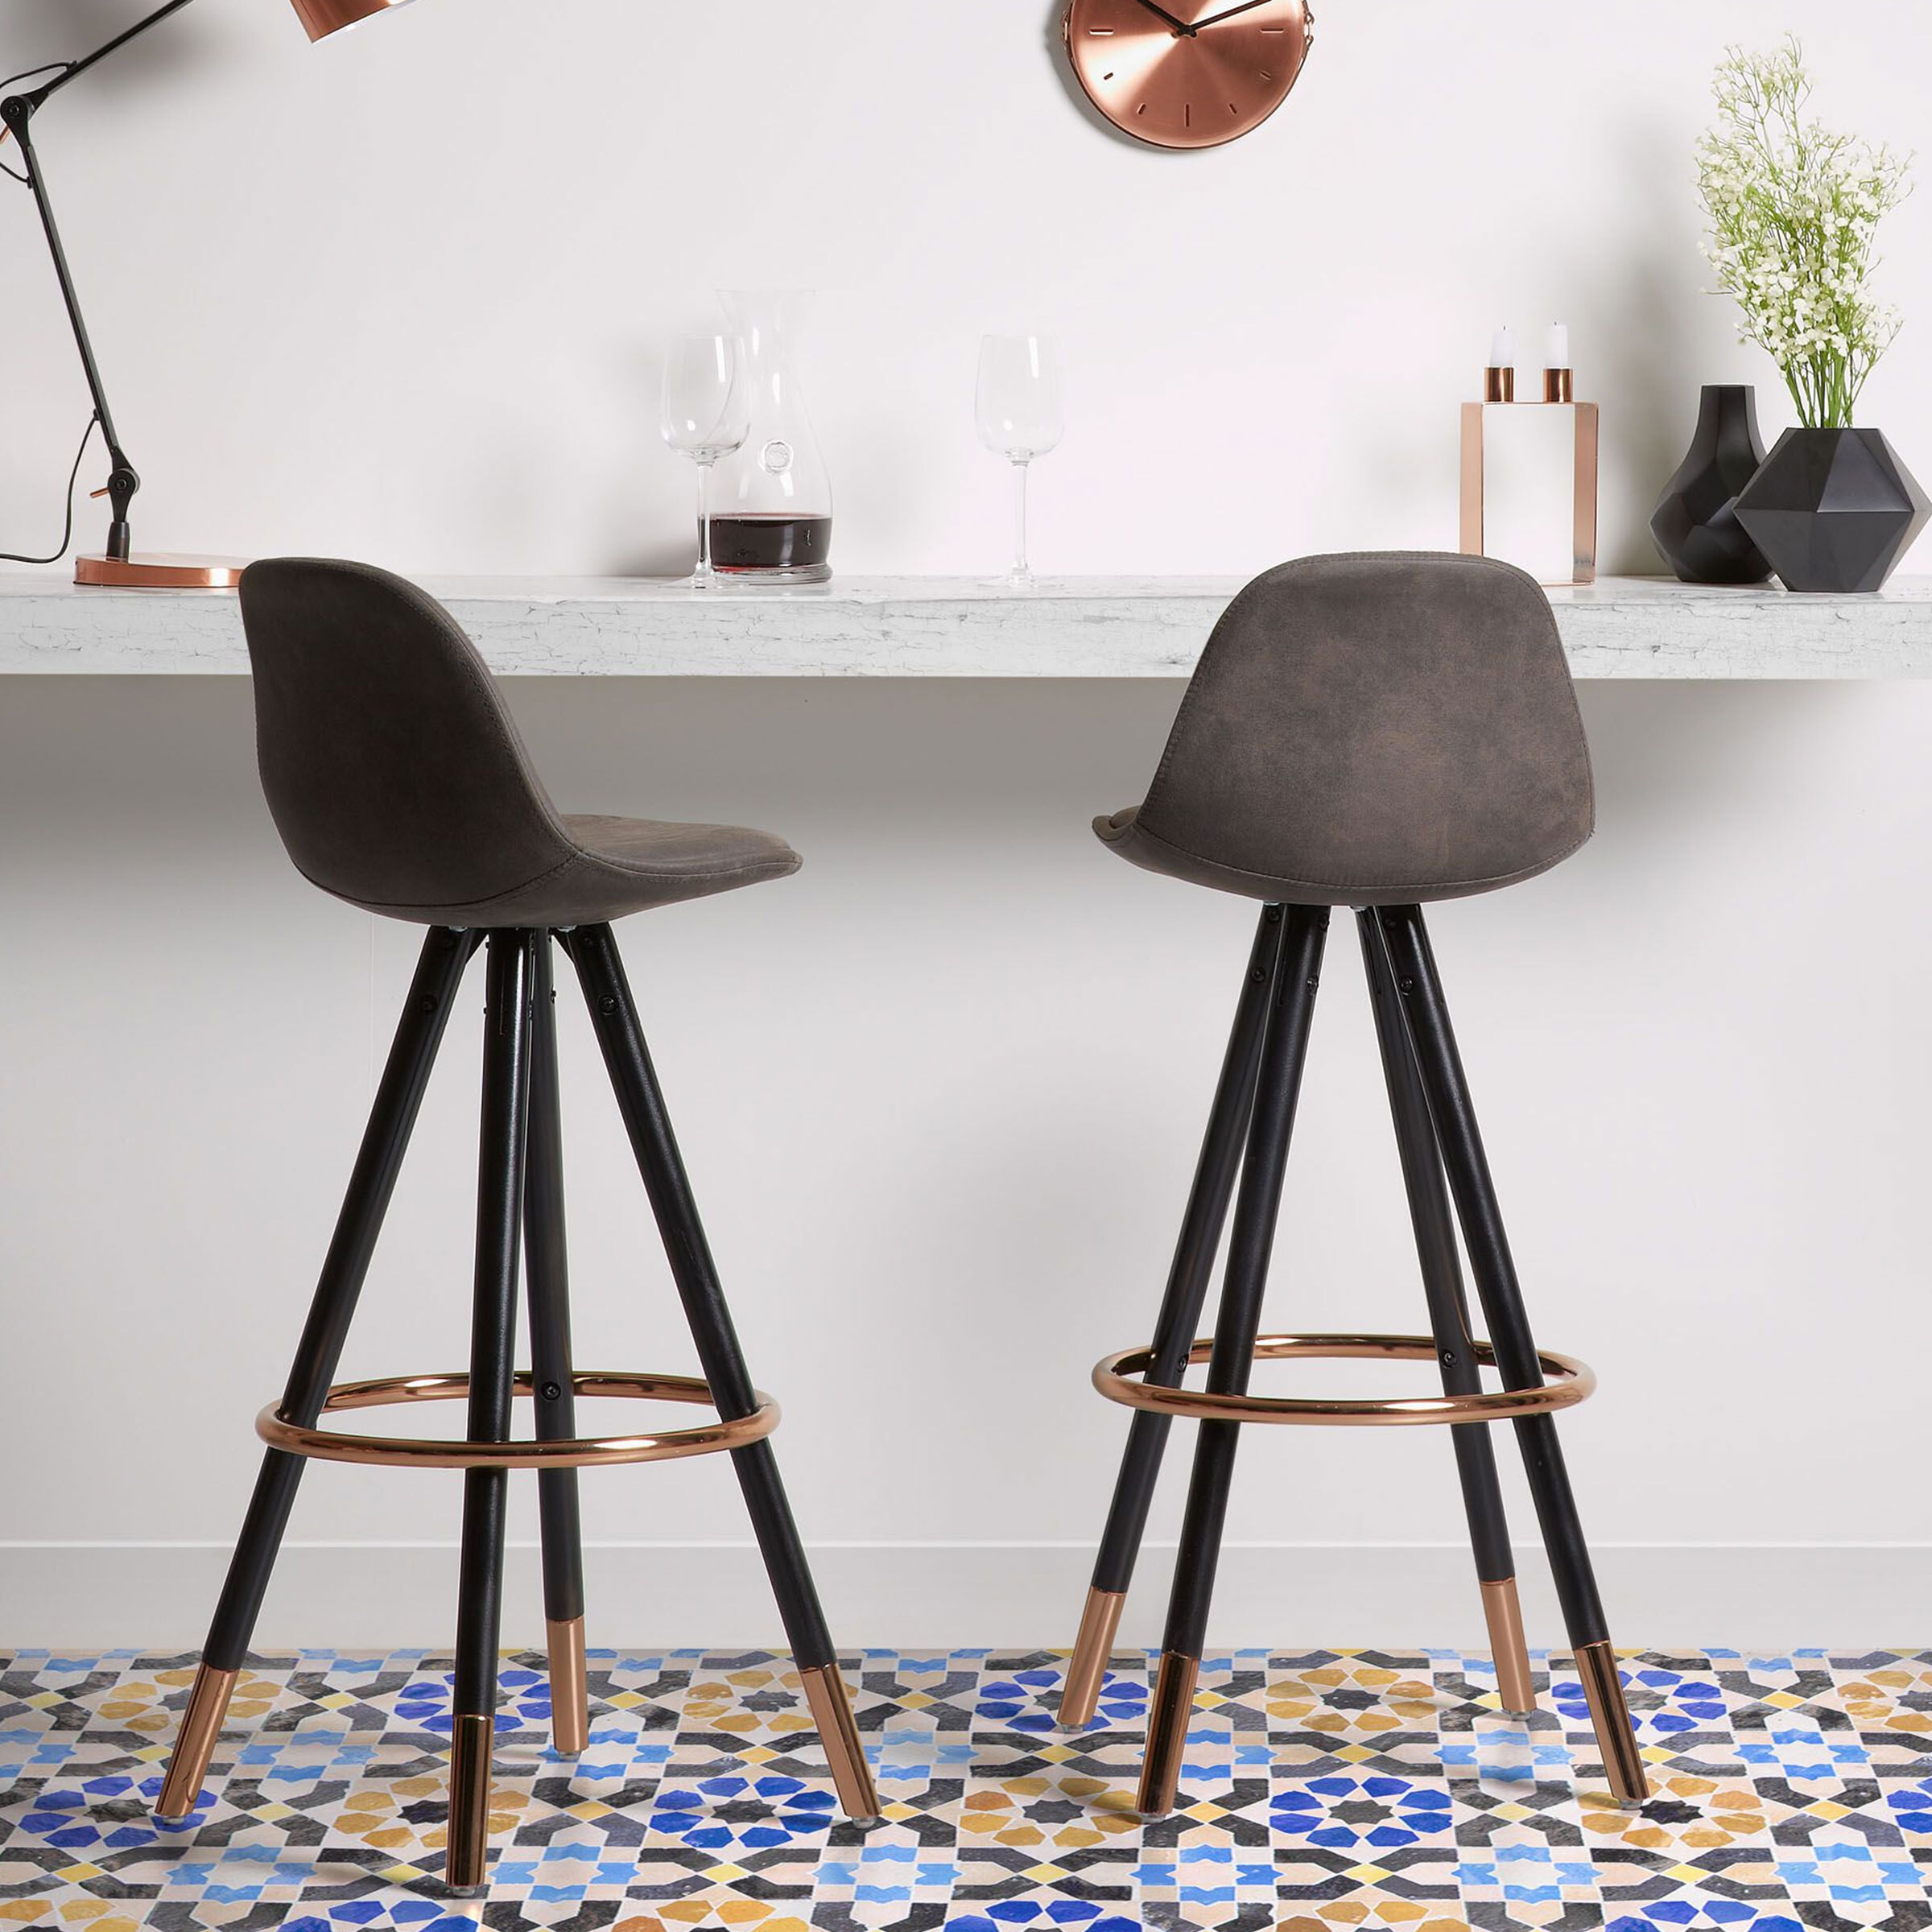 Kave Home barkruk 'Slad Copper' zithoogte 75cm, kleur grafiet